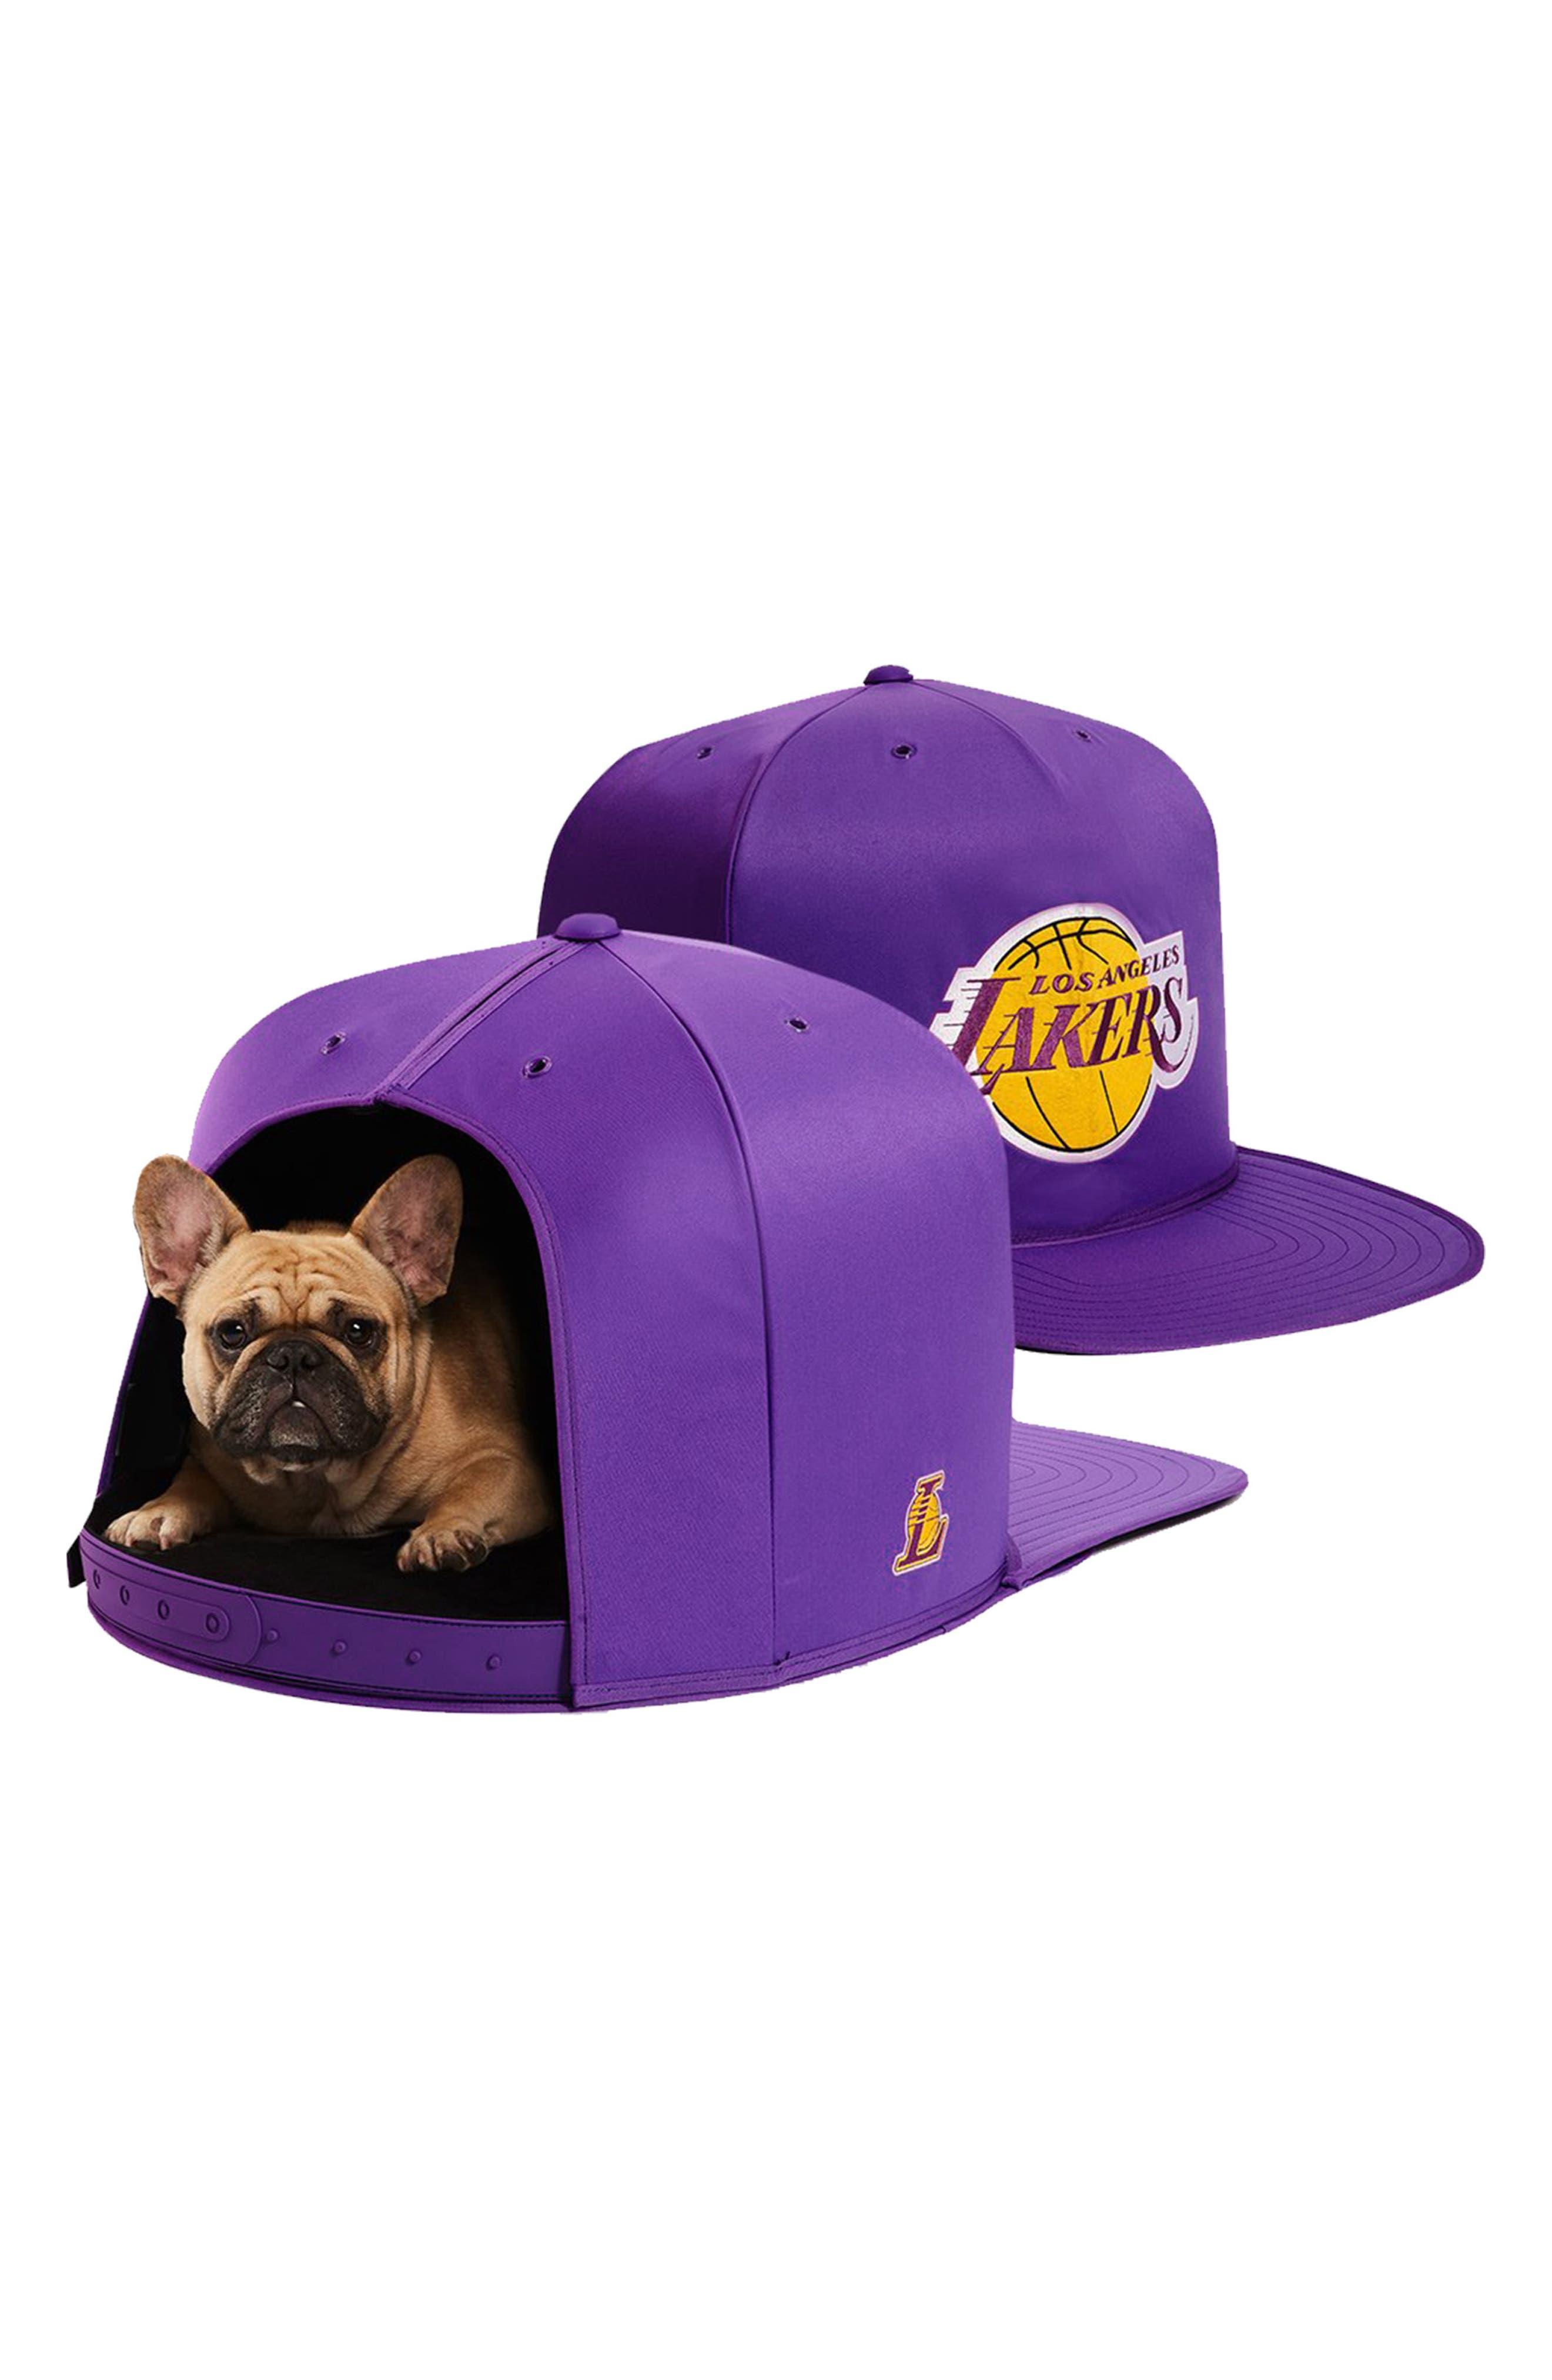 Los Angeles Lakers Pet Bed,                             Alternate thumbnail 3, color,                             Purple